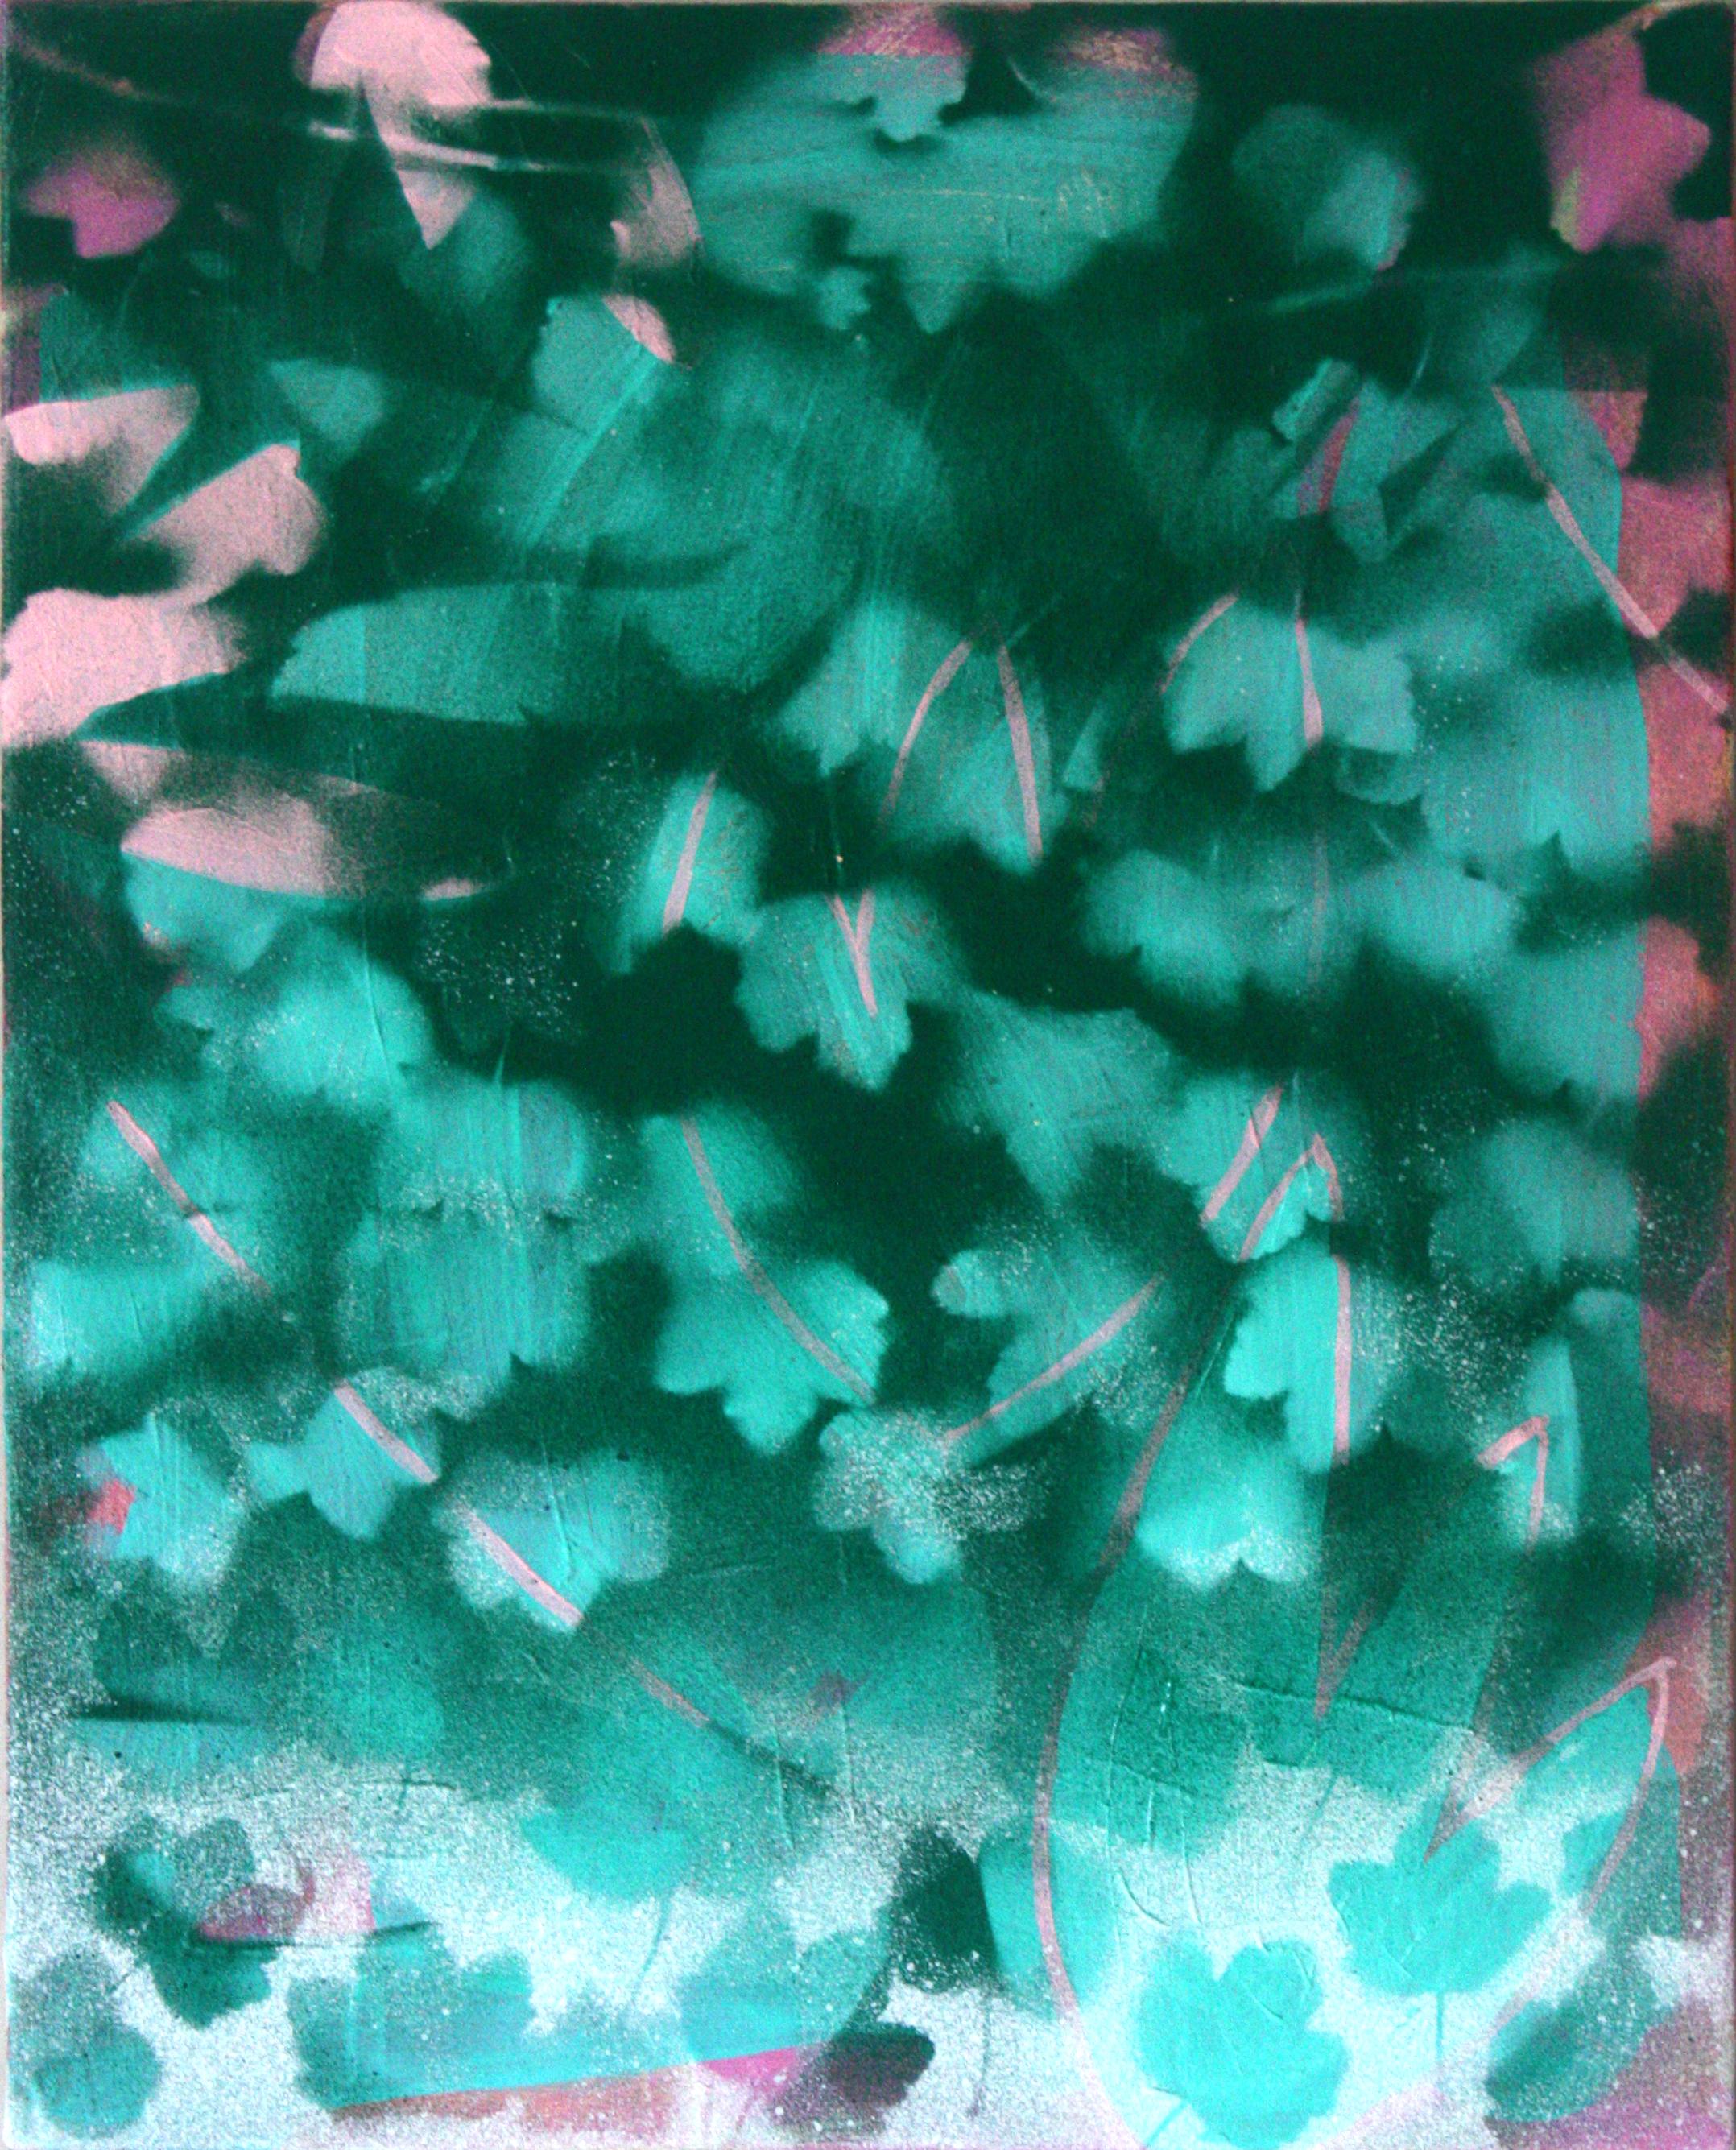 Lost in shadows, 40 x 51cm, acrylic pigment spray on canvas, 2019